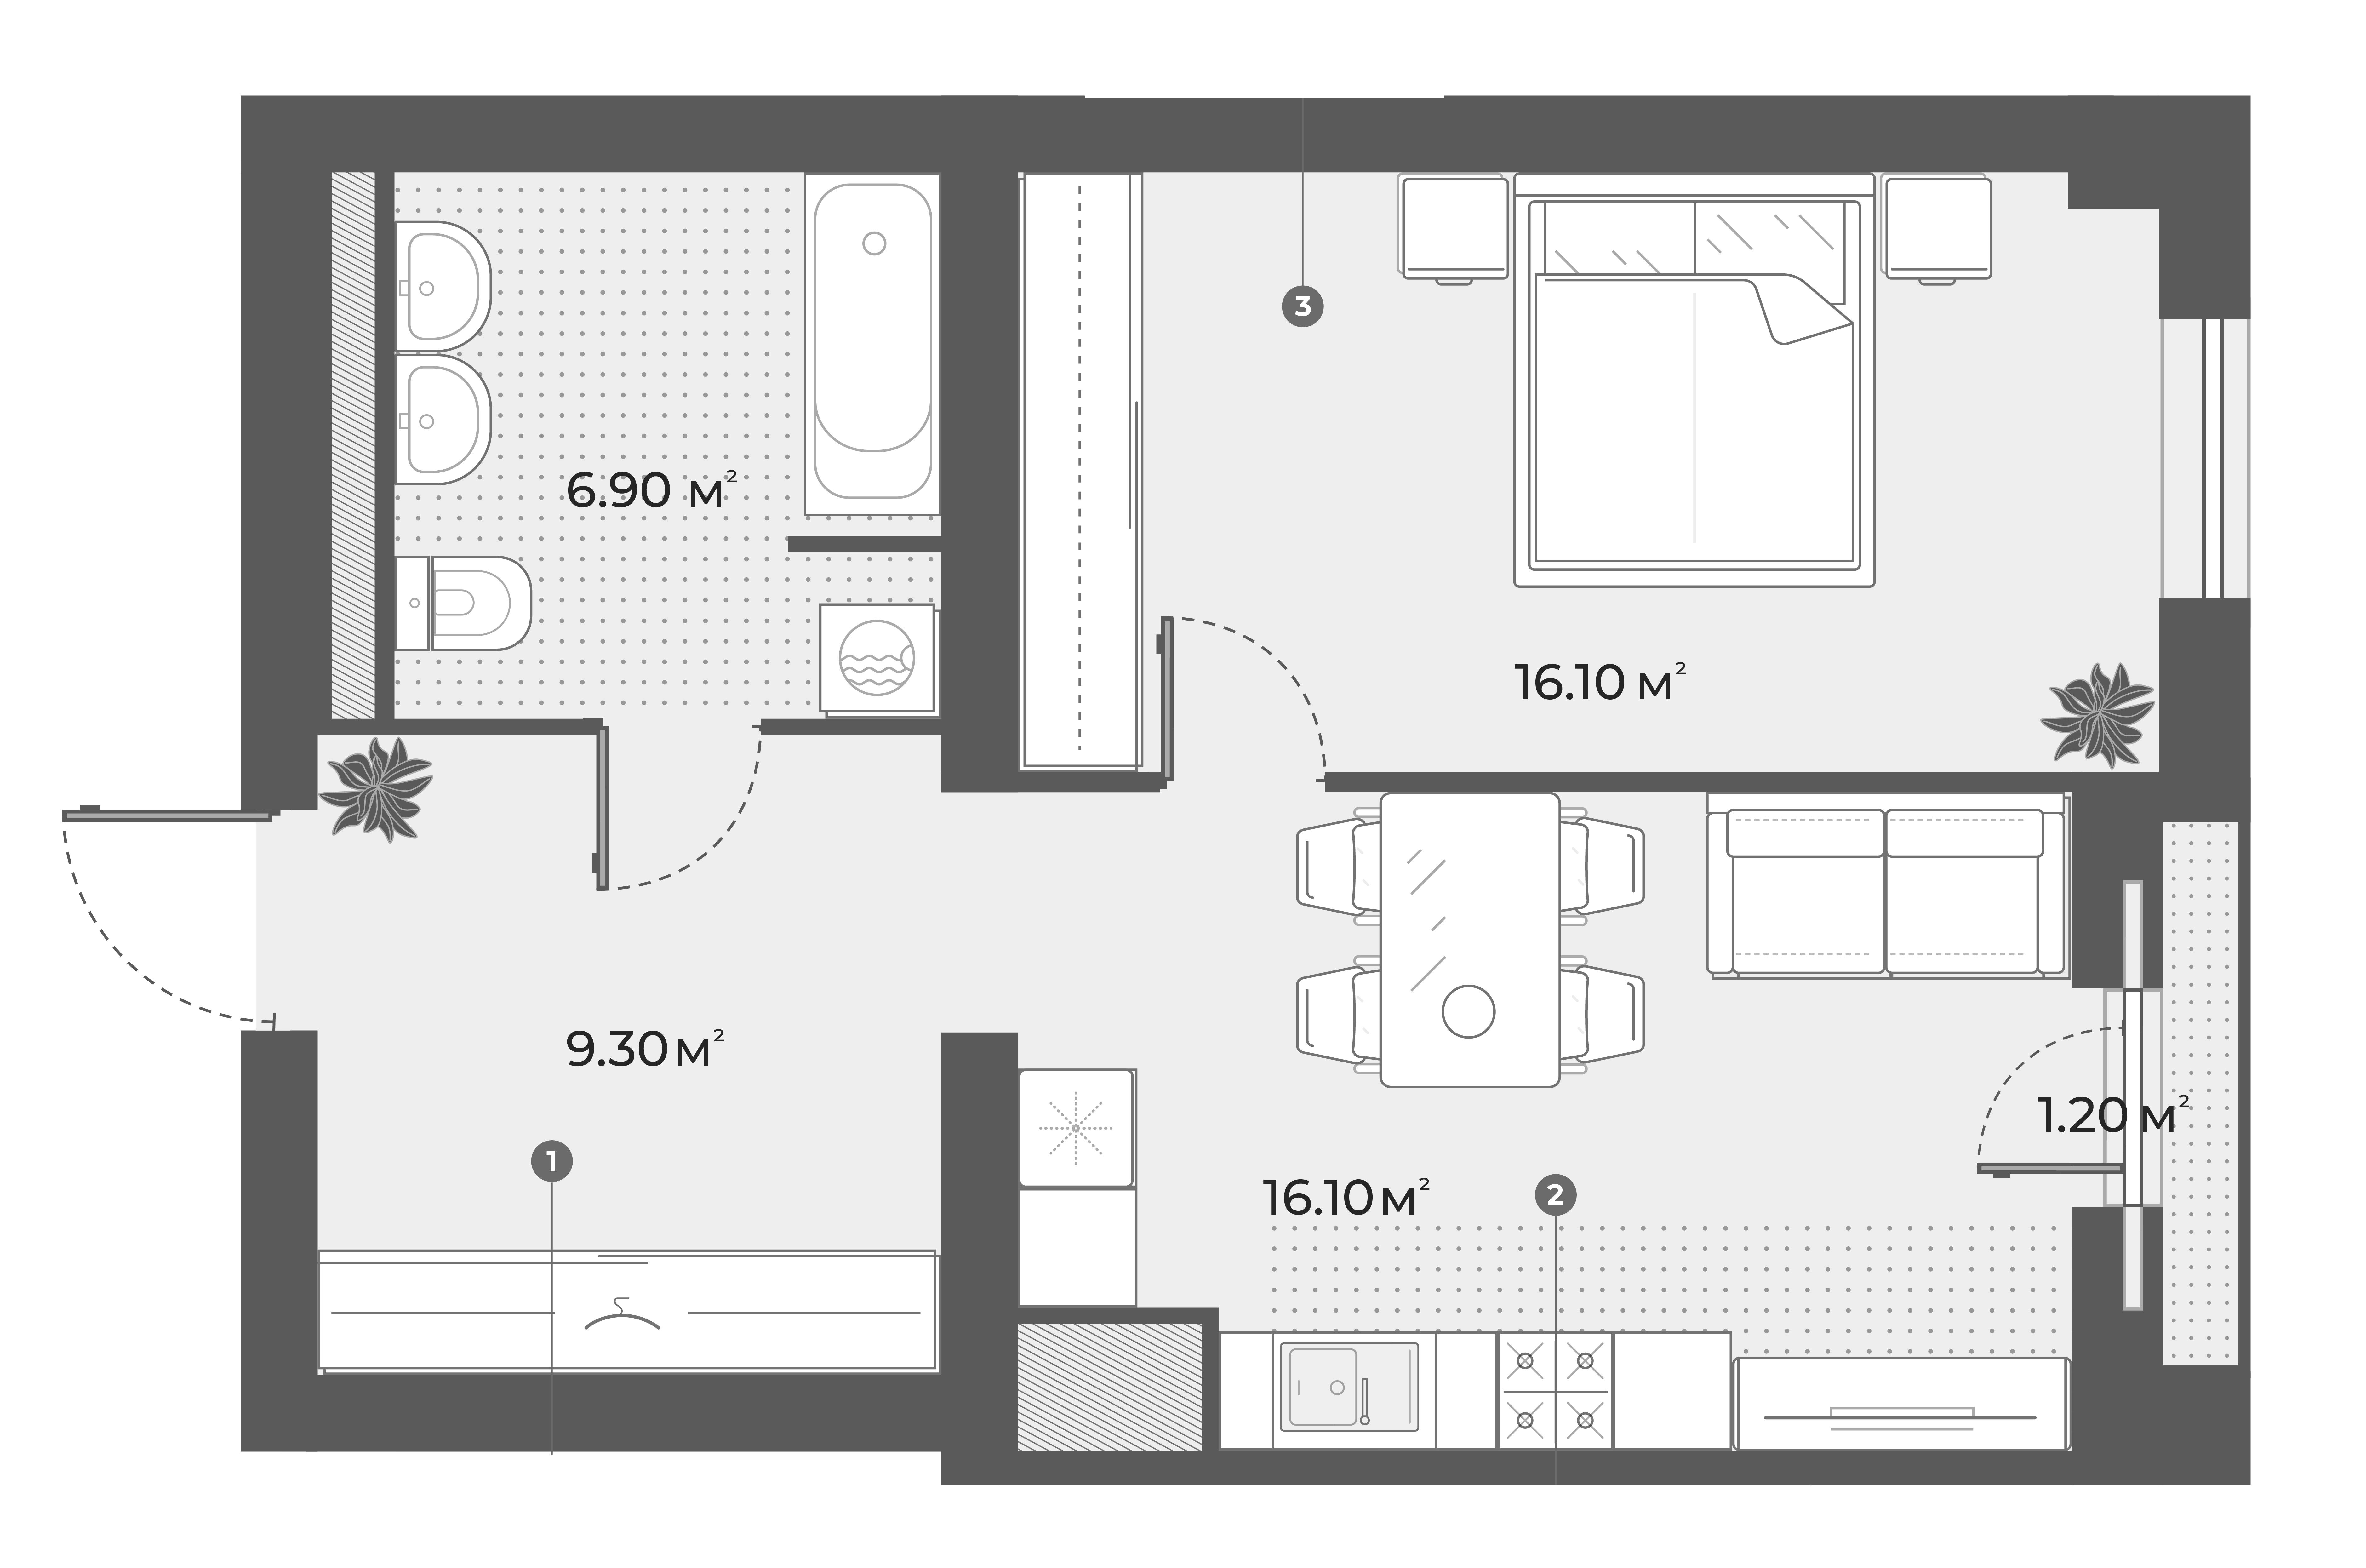 2Е-комнатная квартира, 48.4 м², 4 этаж – Планировка